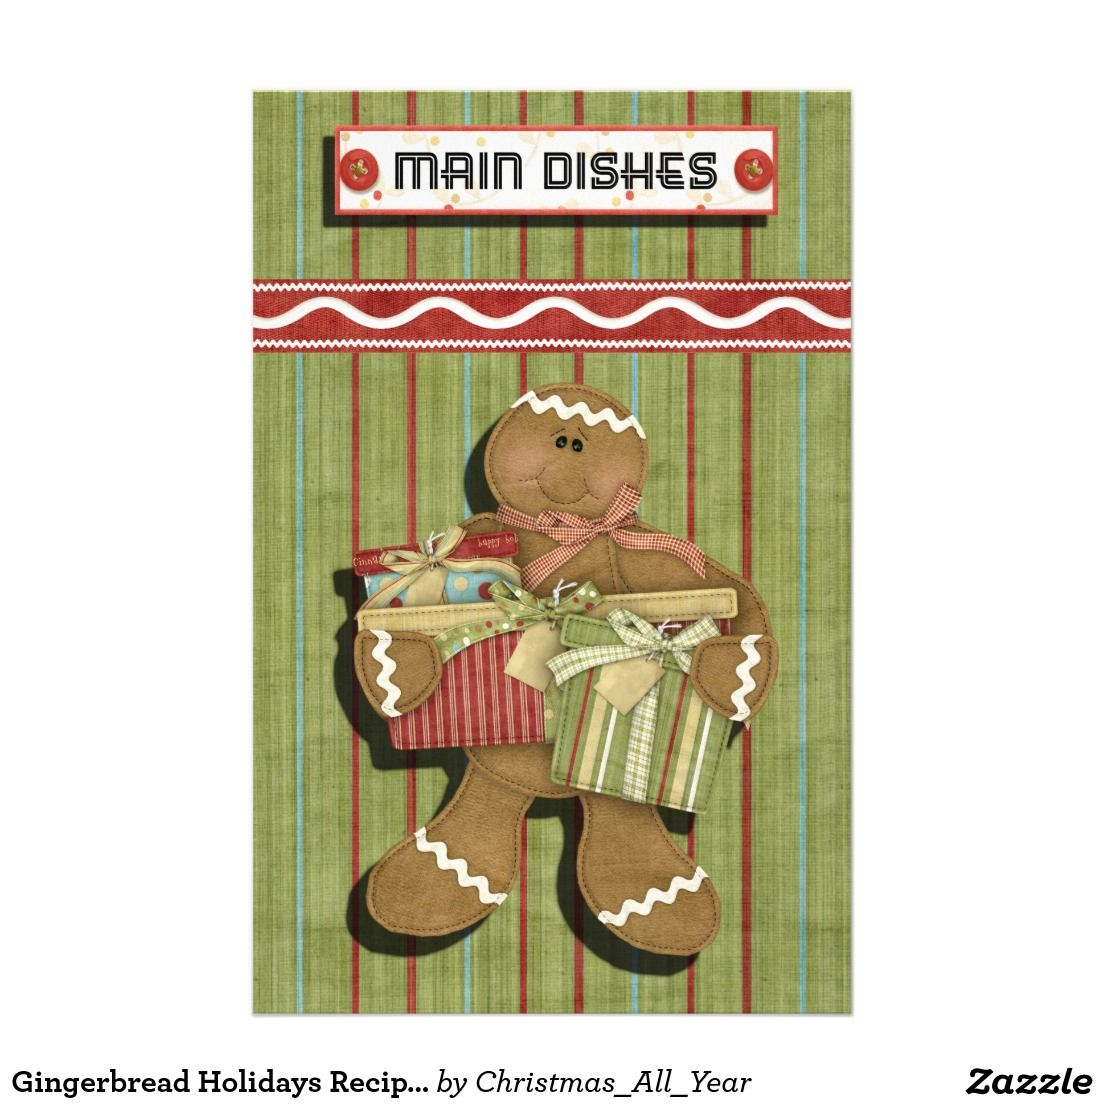 Gingerbread Holidays Recipe Binder-Divider Stationery